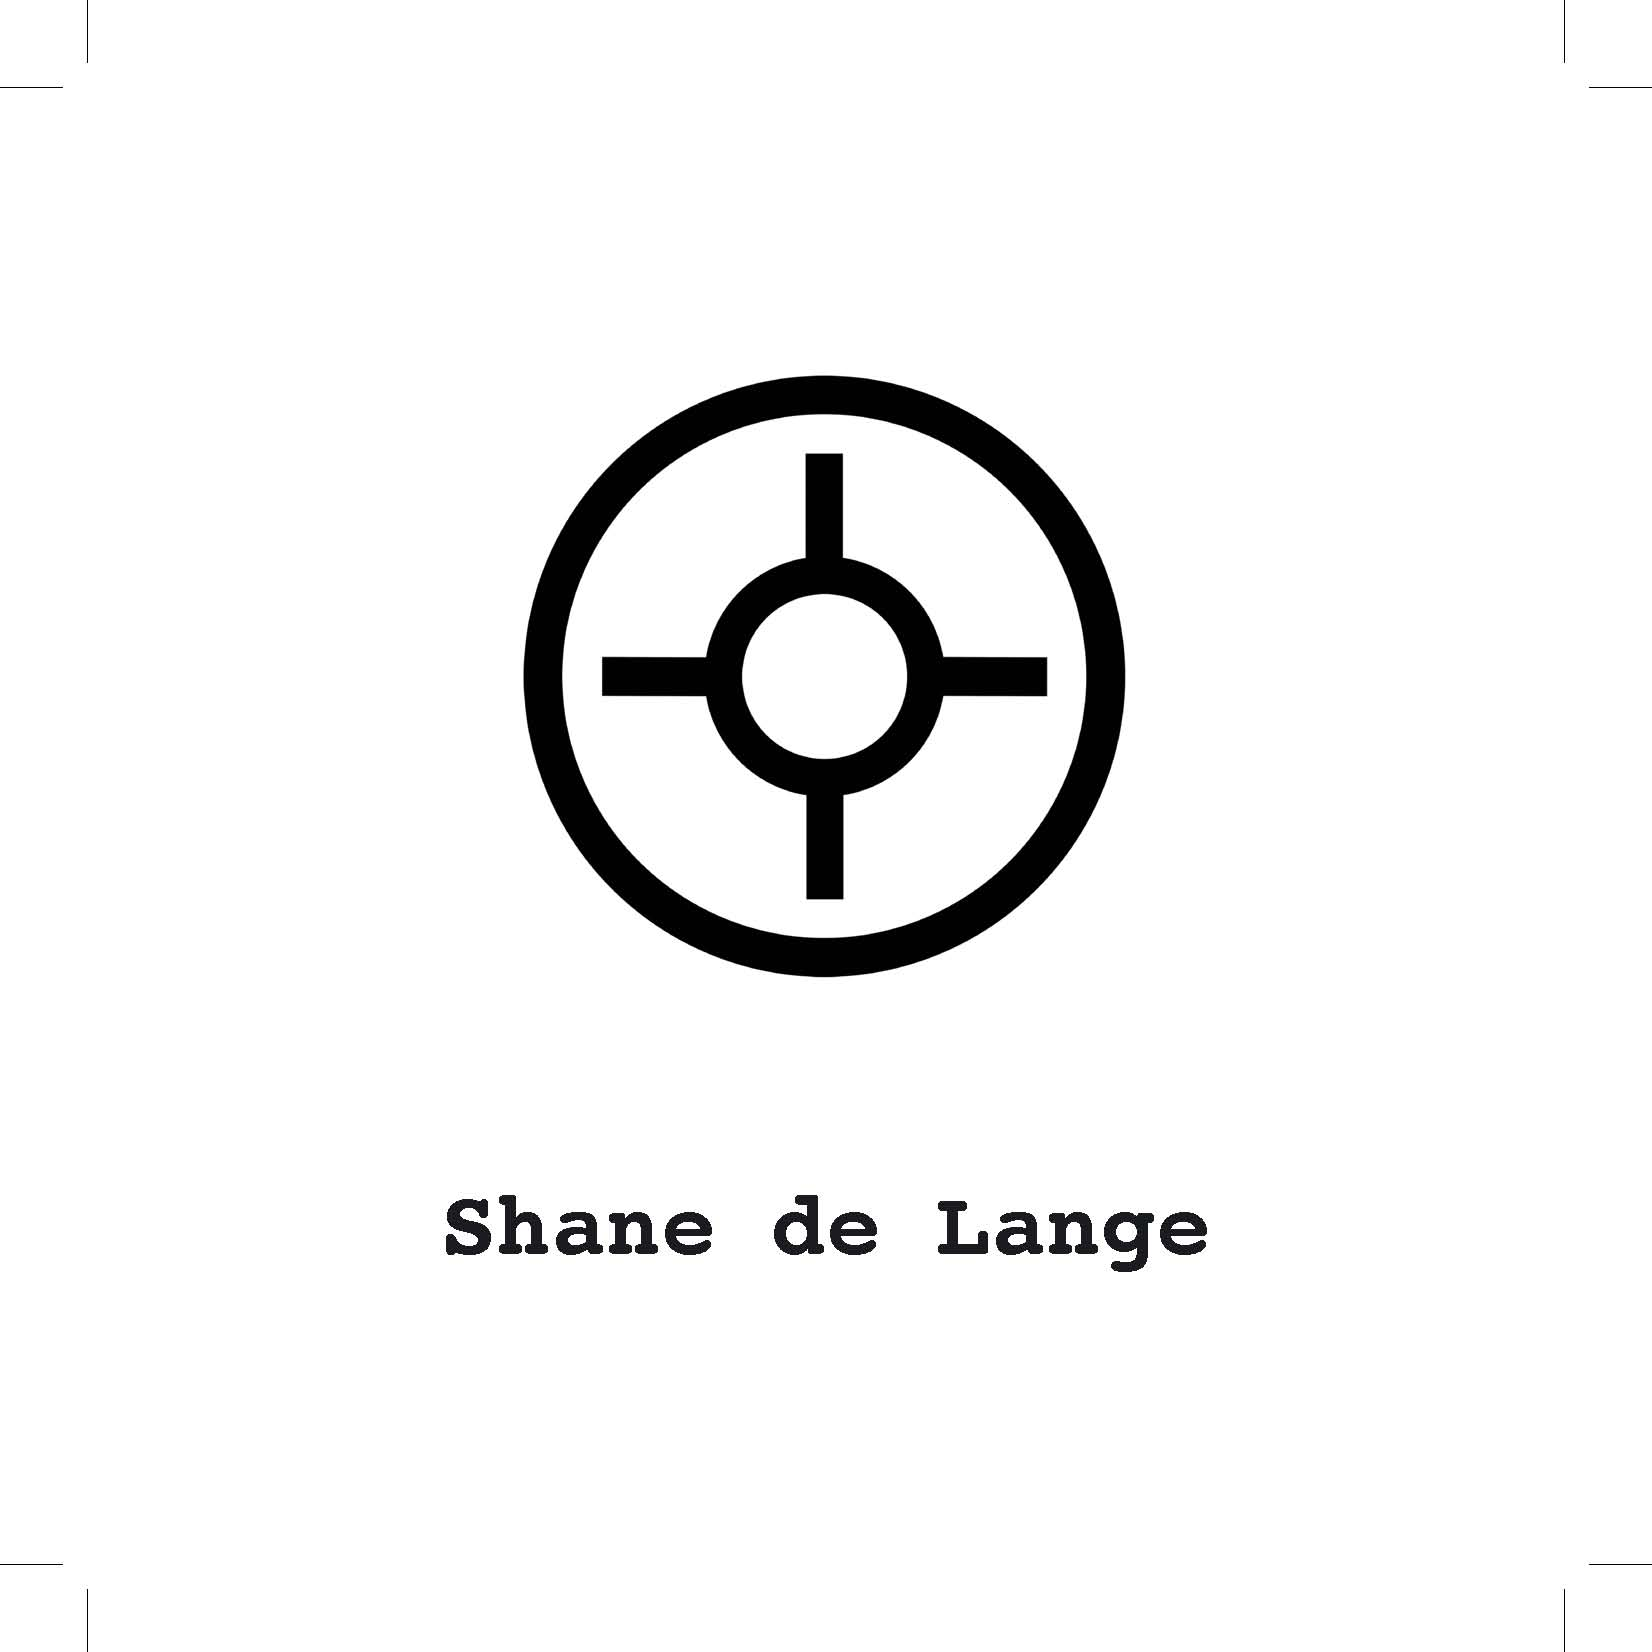 MAP Southafrica - Shane de Lange